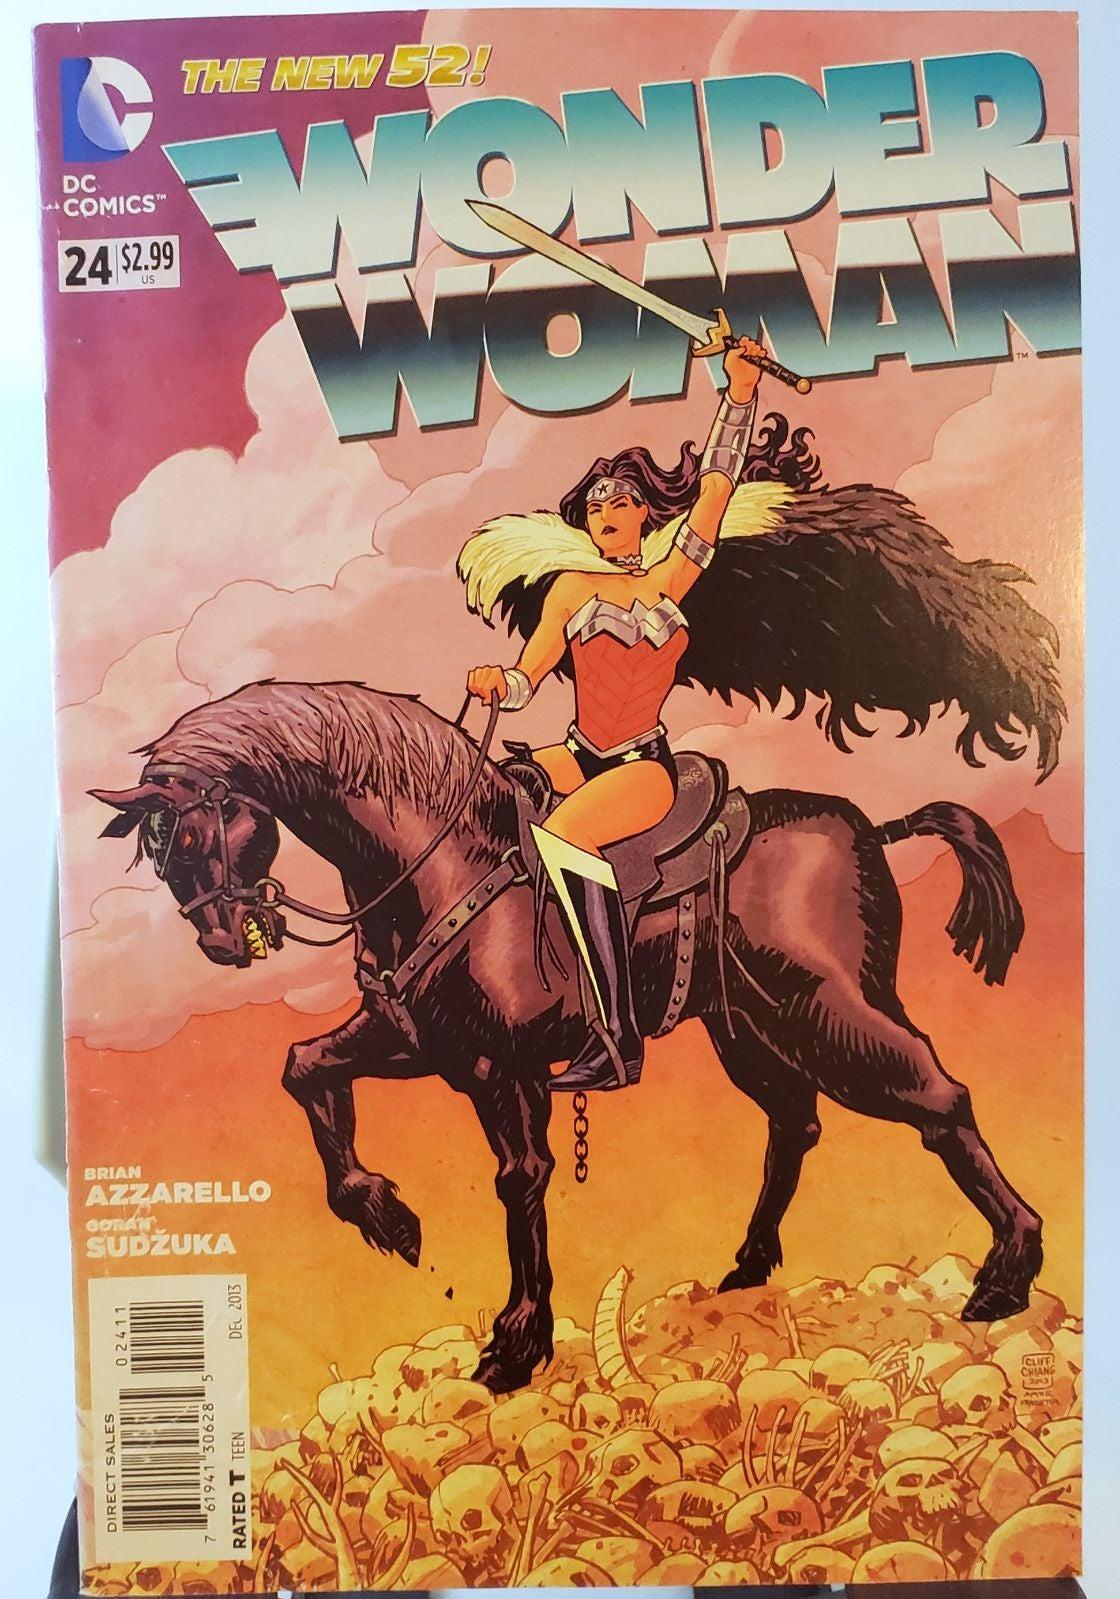 Wonder Woman Issue 24 New 52 DC COMICS